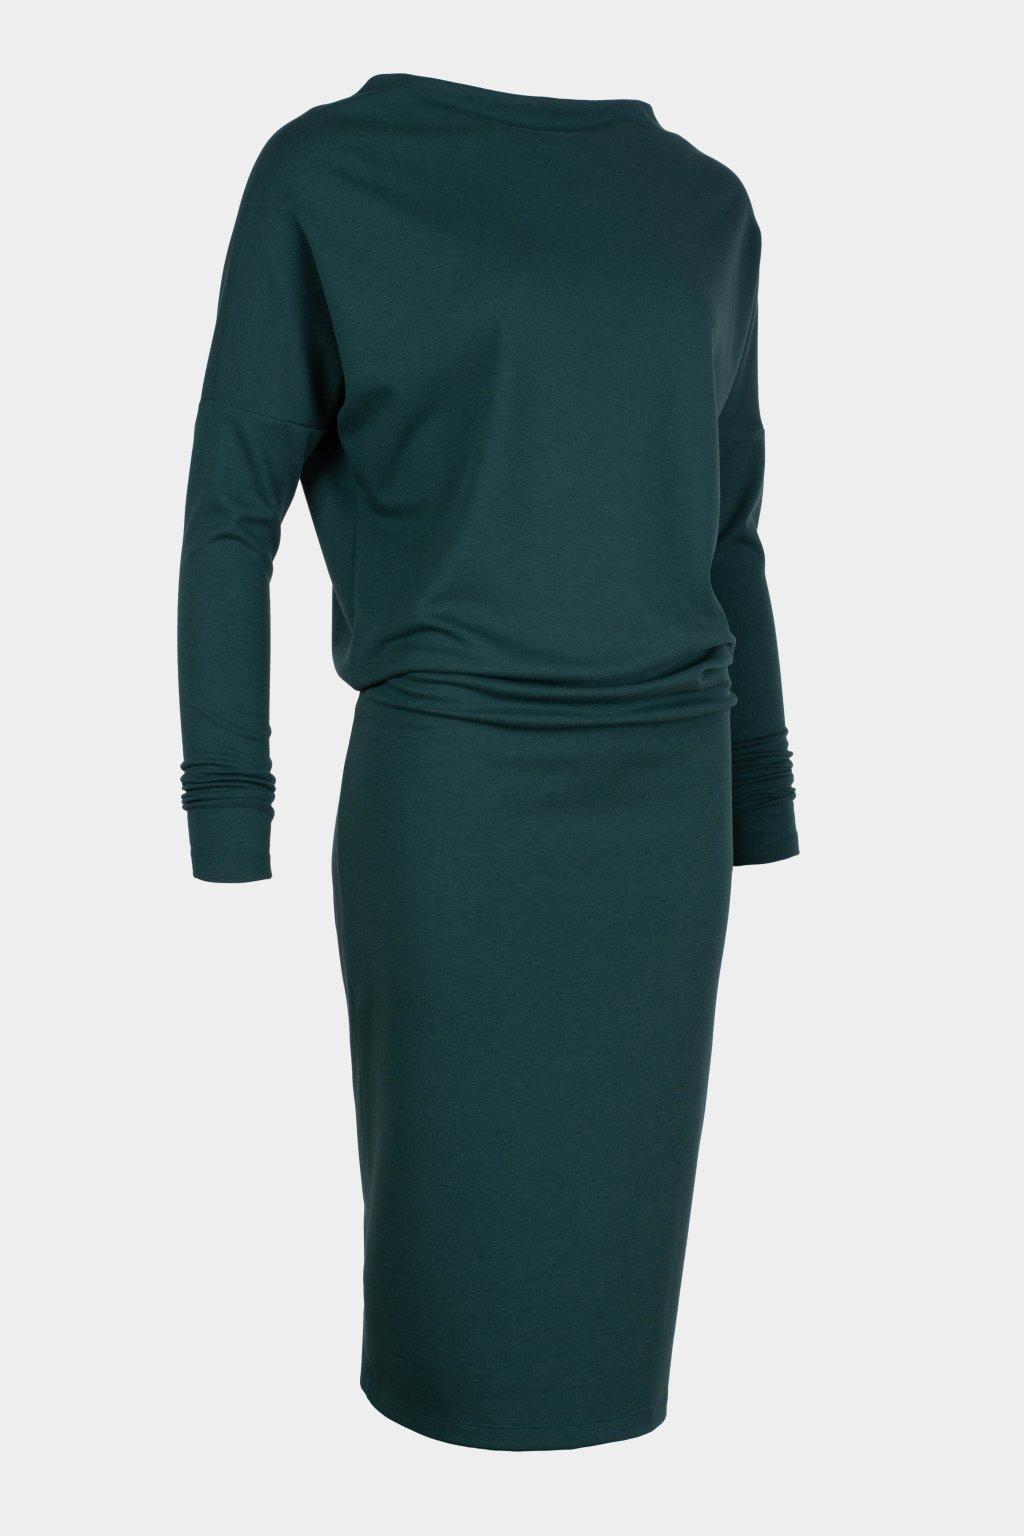 Šaty zelené  31056